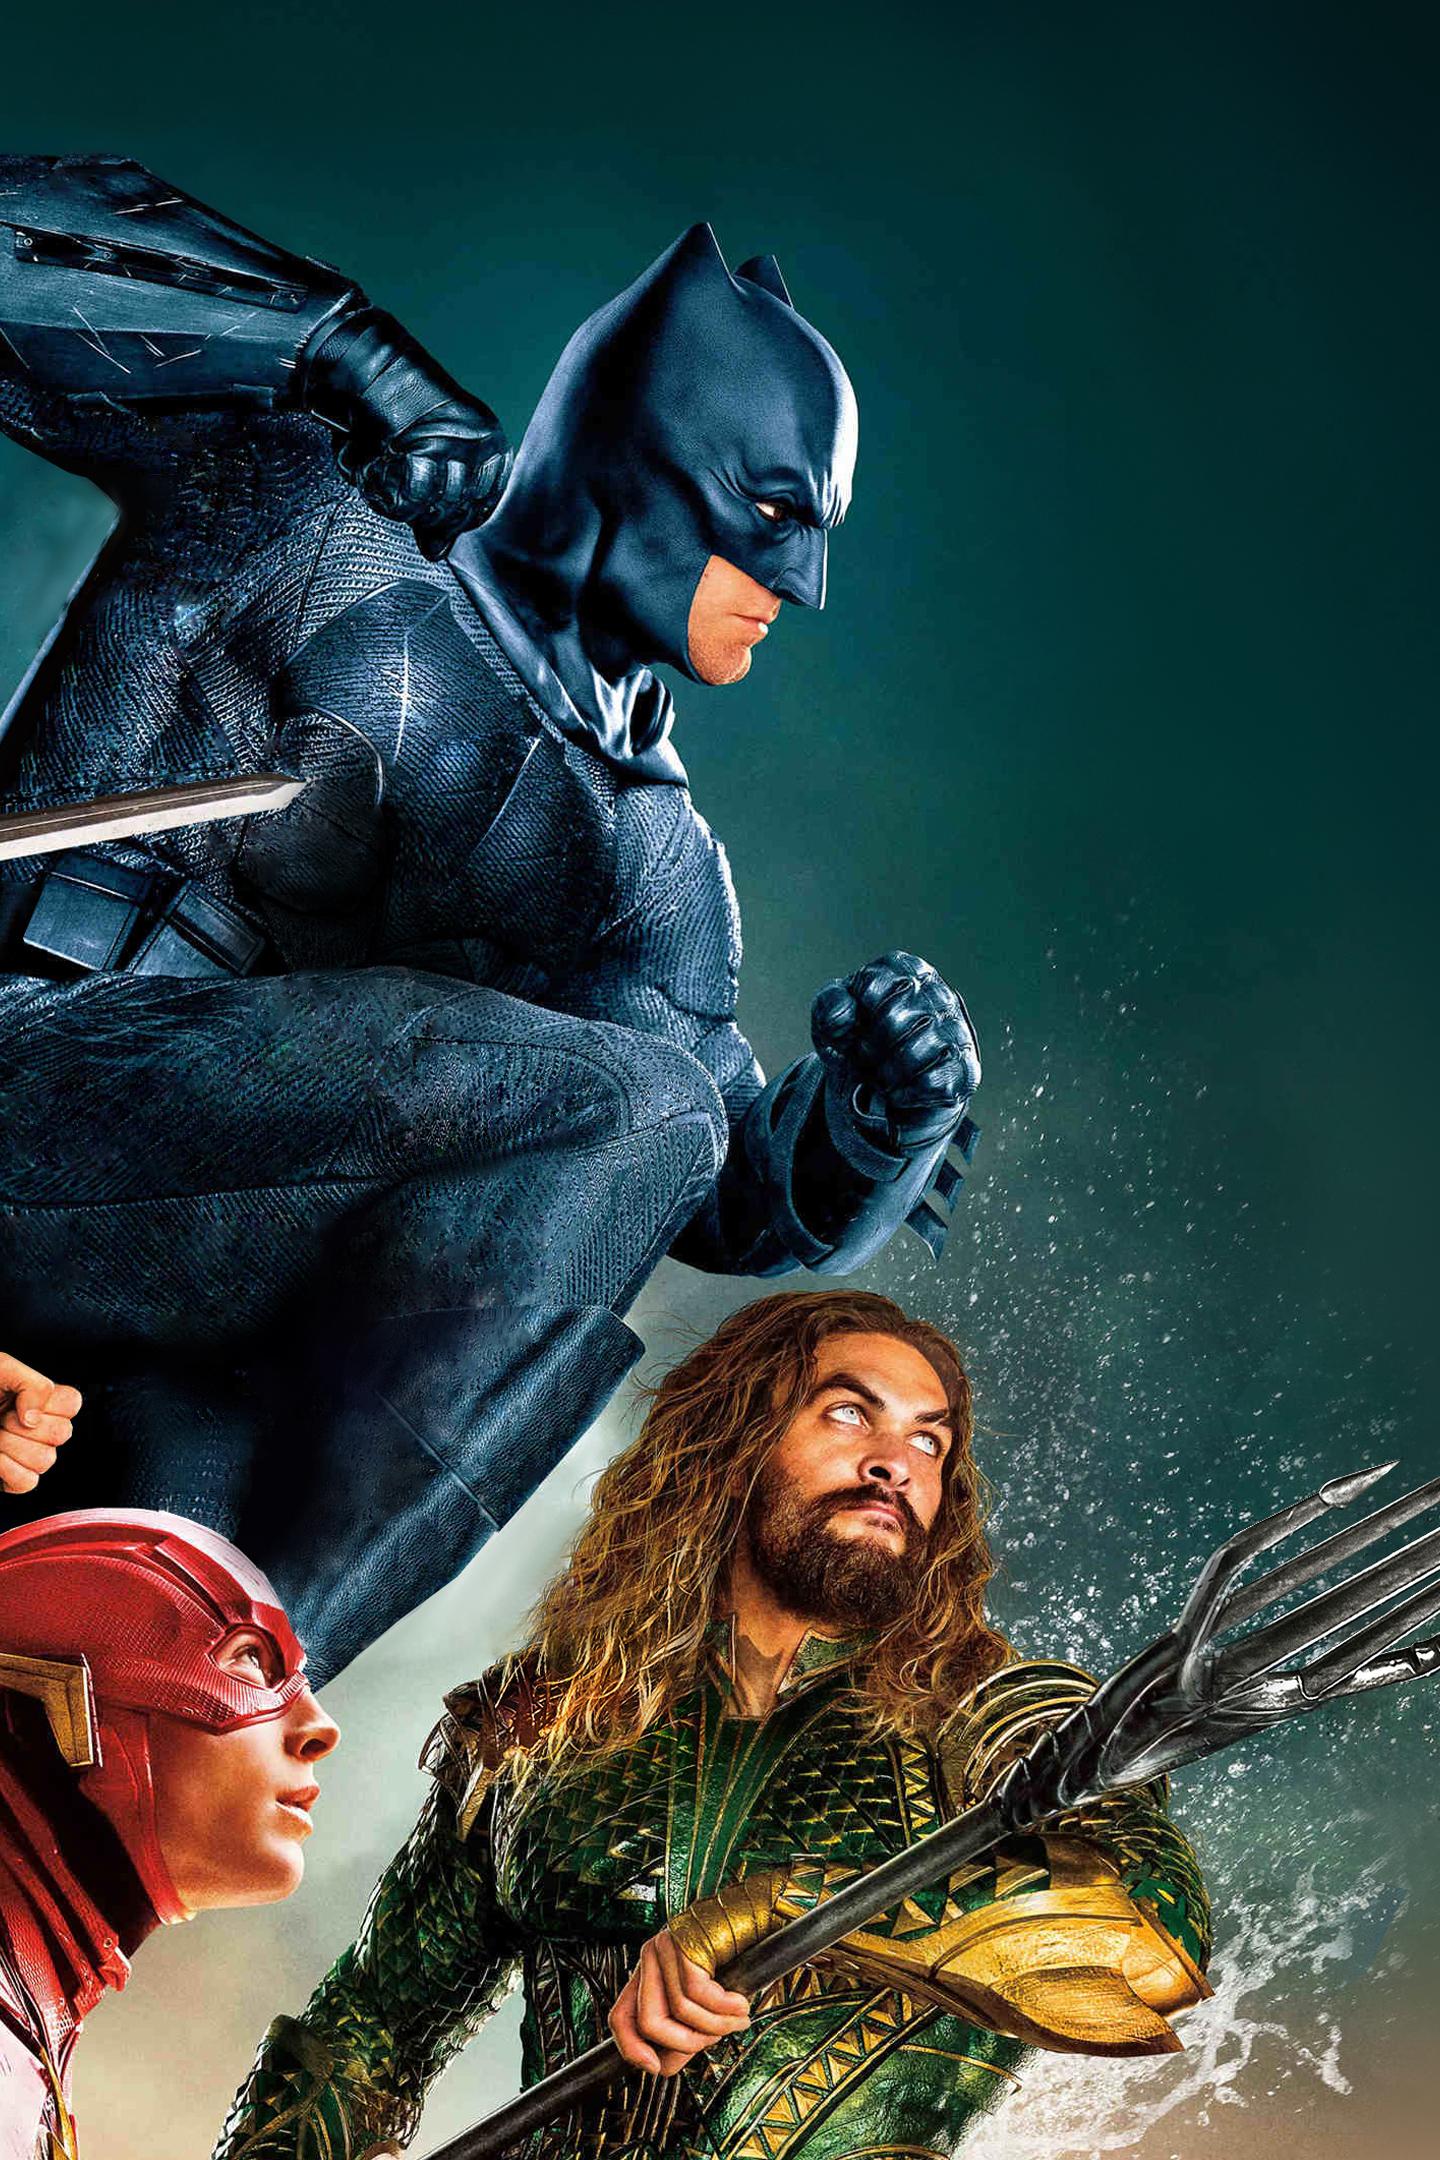 Justice league, movie, superheroes, 1440x2960 wallpaper